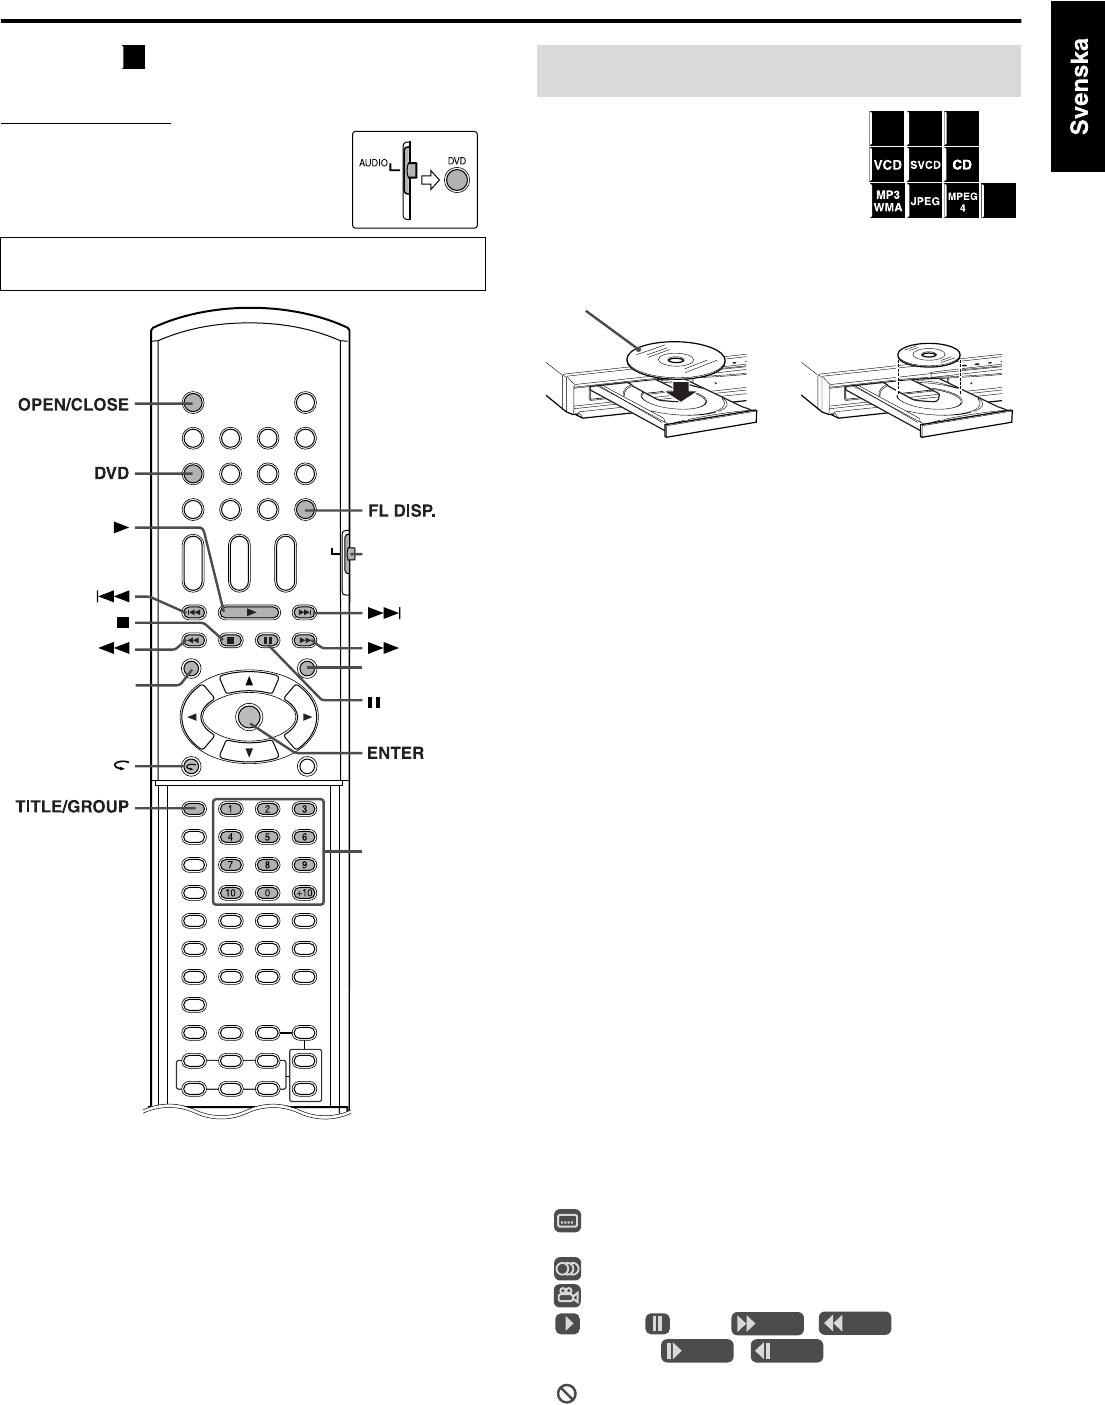 JVC TH S66EN S66/TH S55[EN] User Manual GVT0152 004B